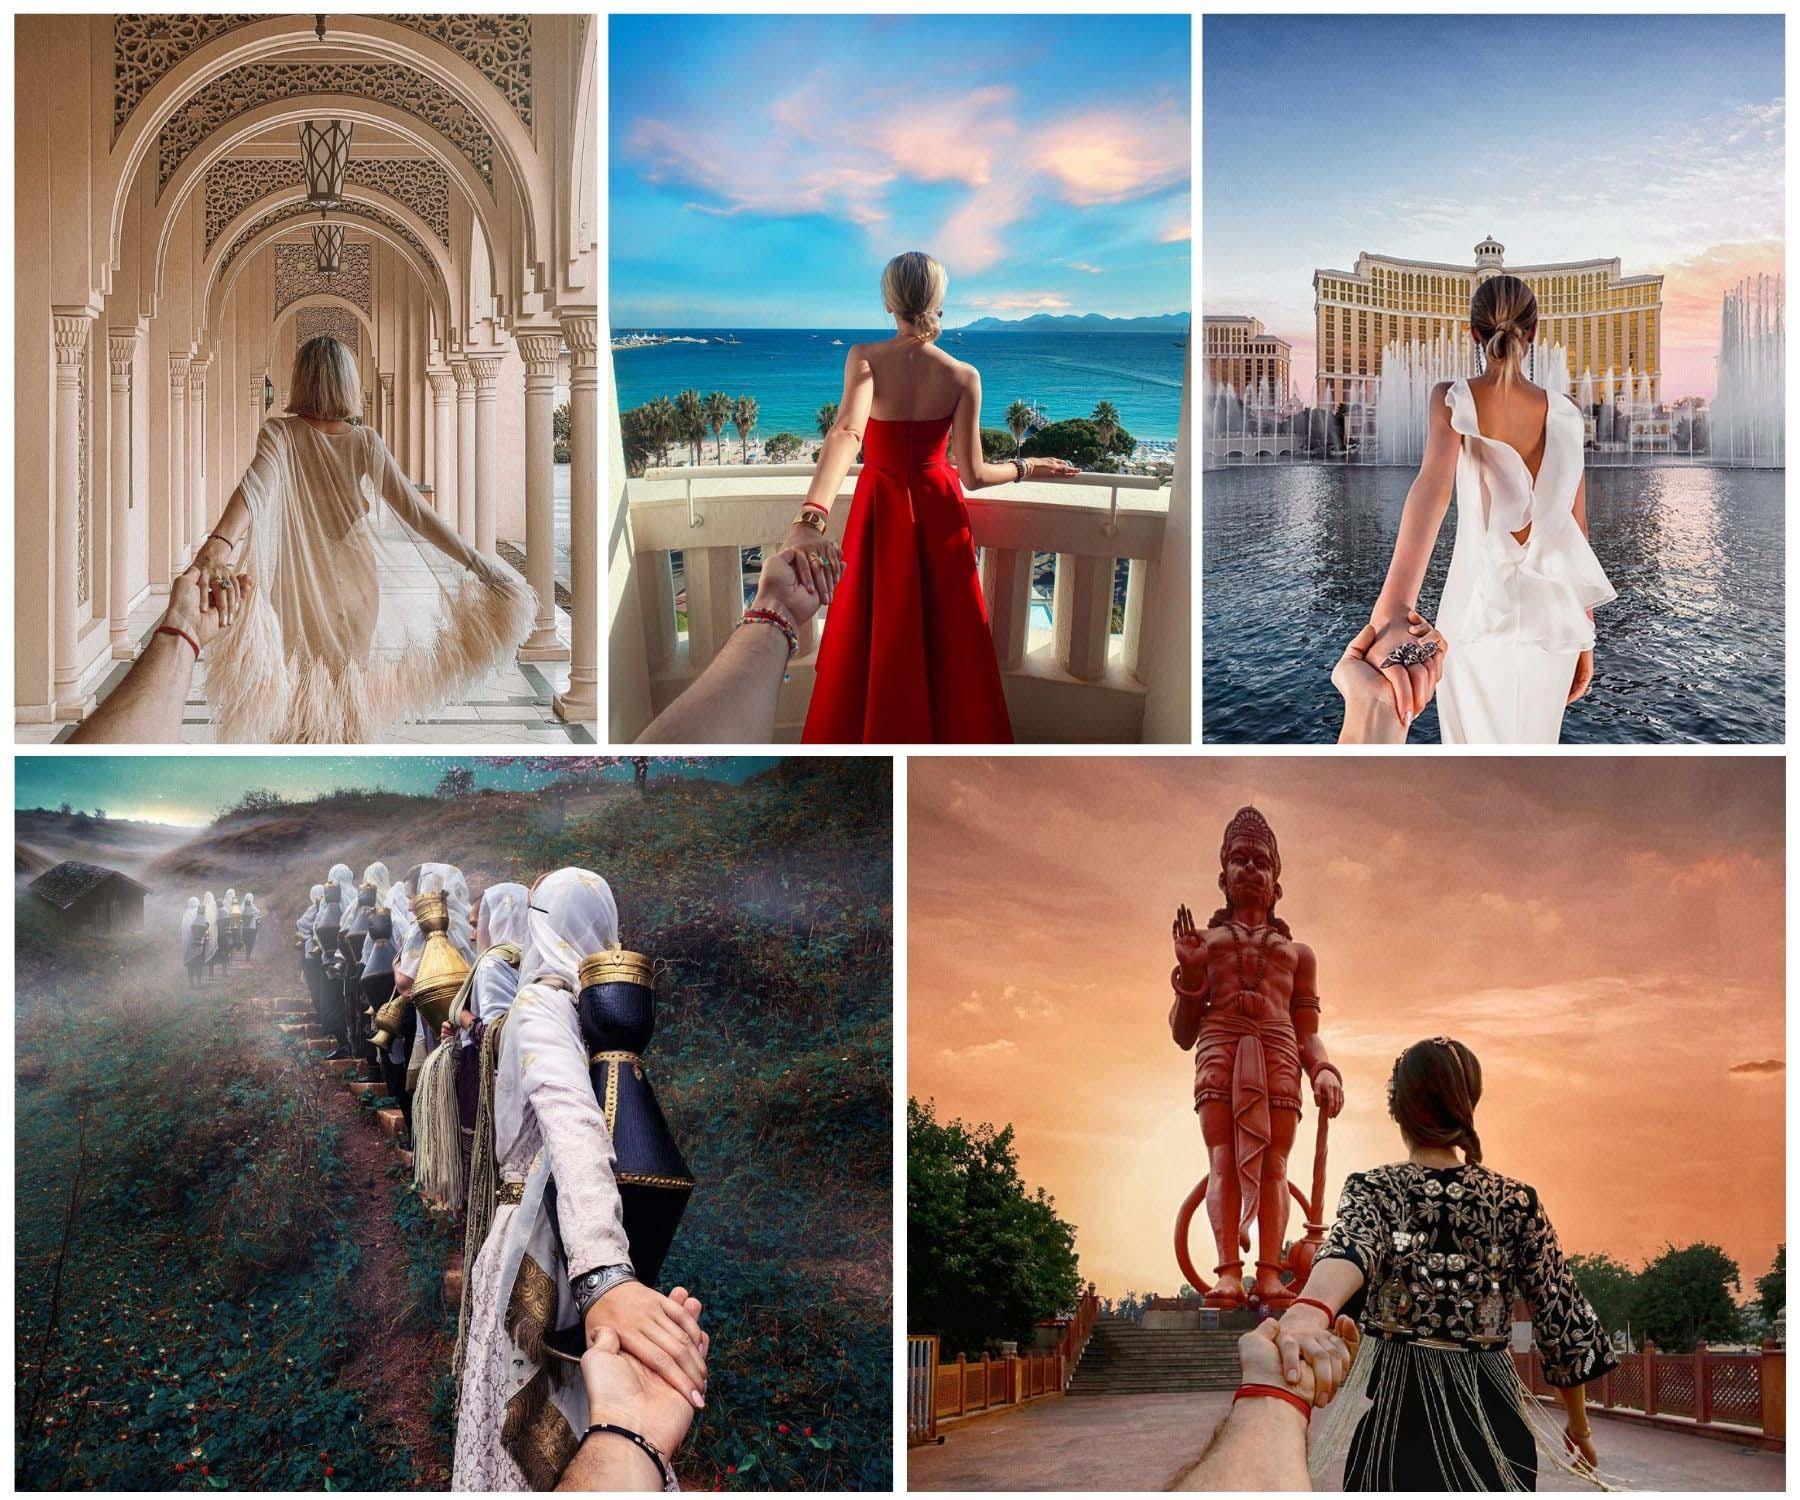 tài khoản instagram du lịch muradosmann